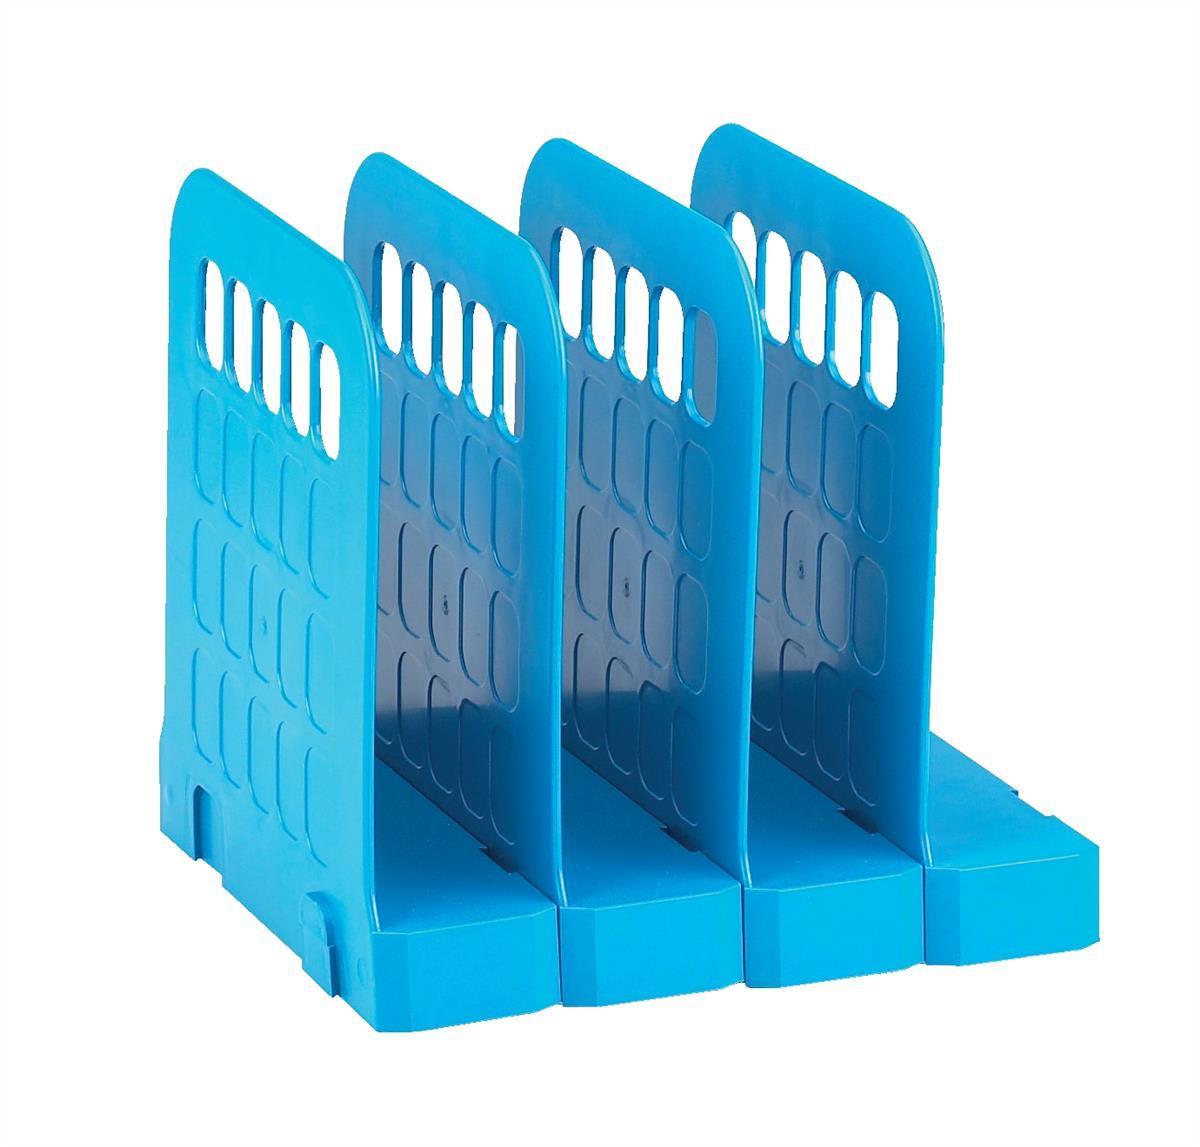 Avery Basics Book Rack Modular Interlocking Base 4 Sections 200x183x190mm Blue Code 1136BLUE